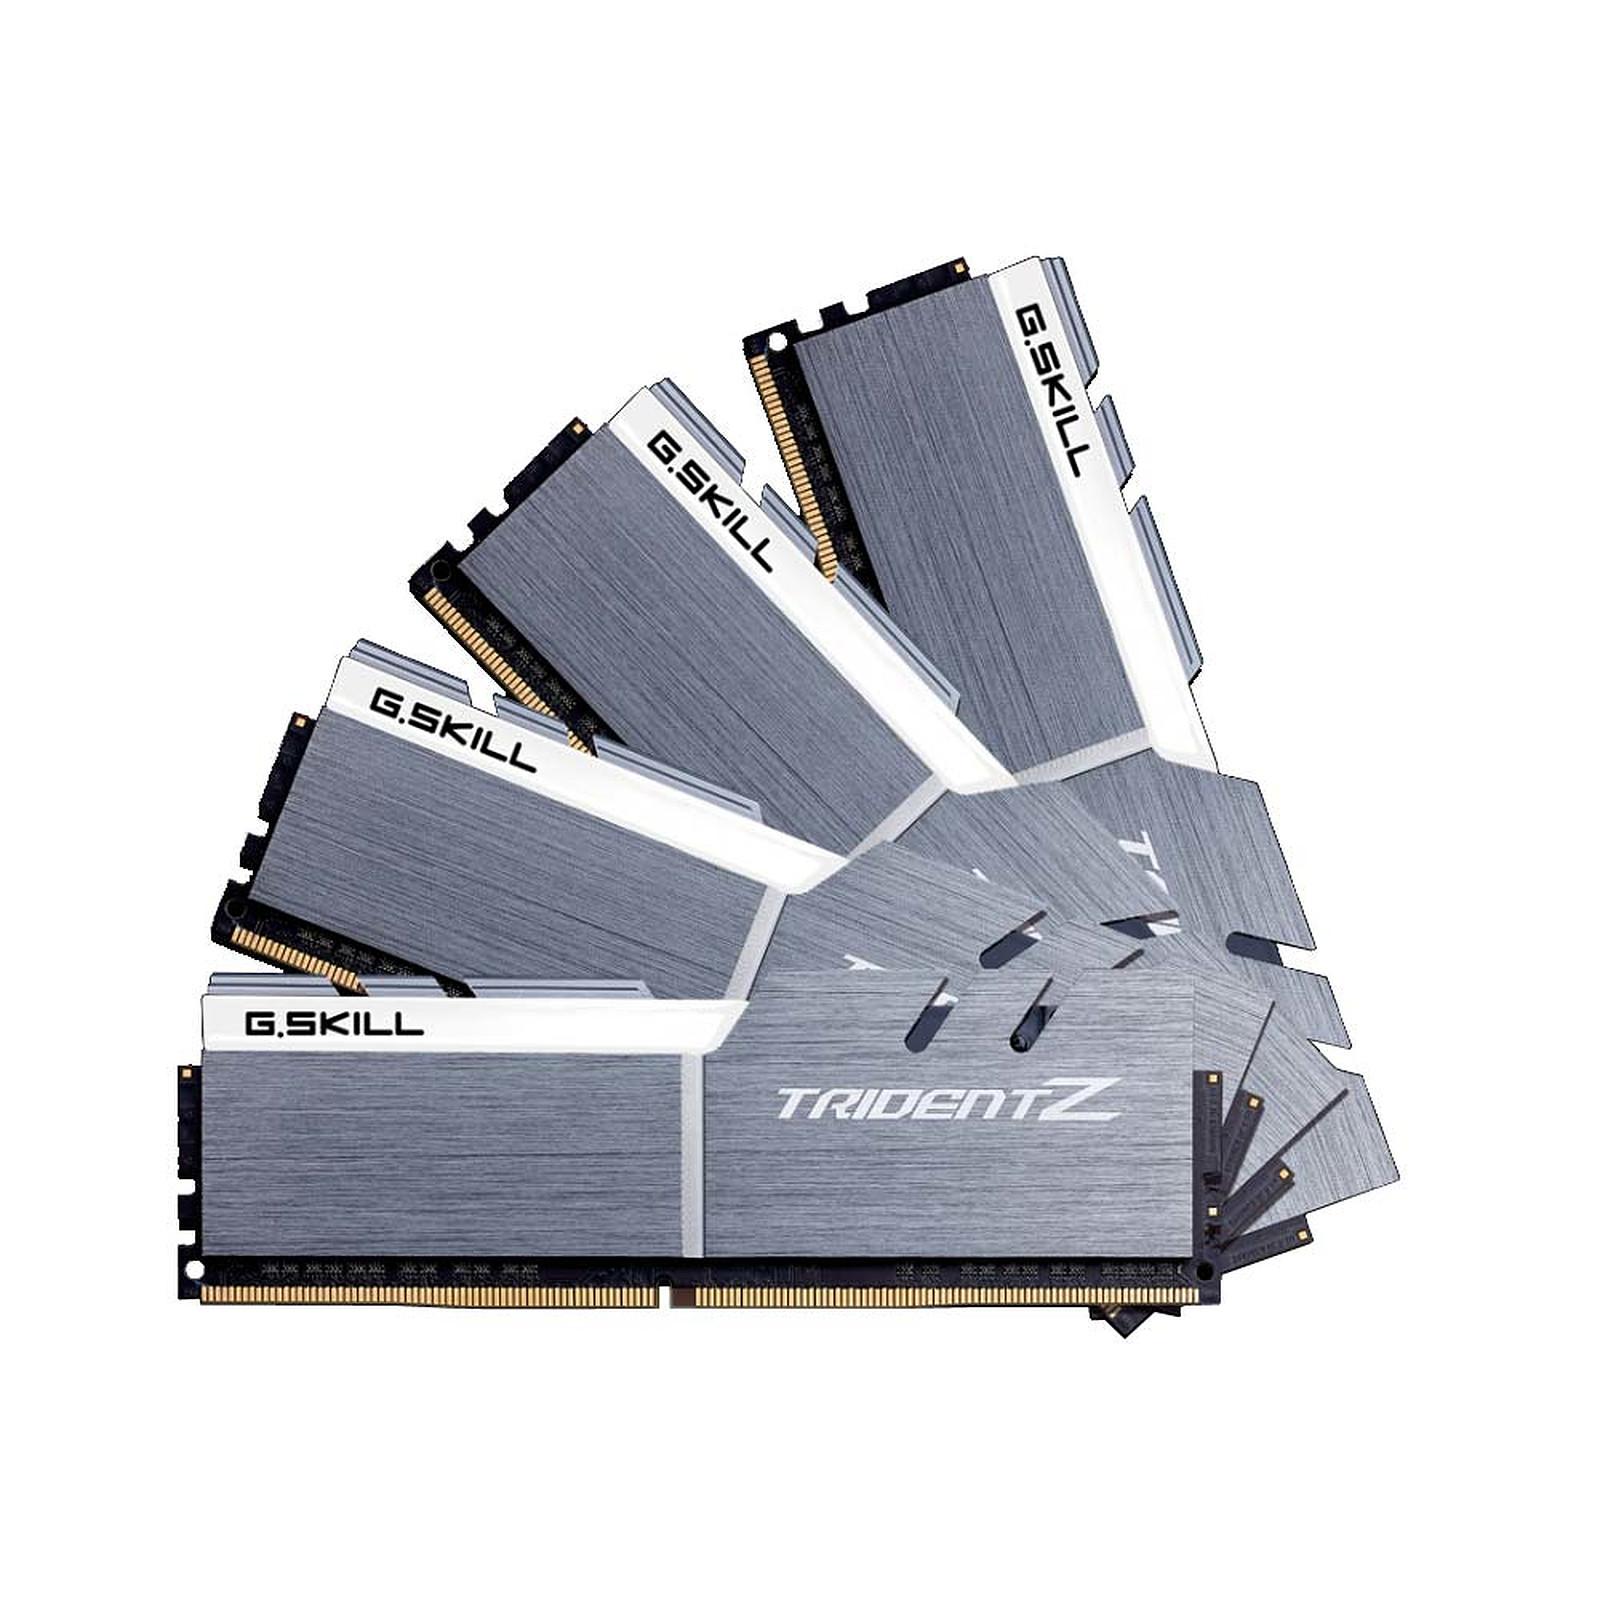 G.Skill Trident Z 32 Go (4x 8 Go) DDR4 3300 MHz CL16